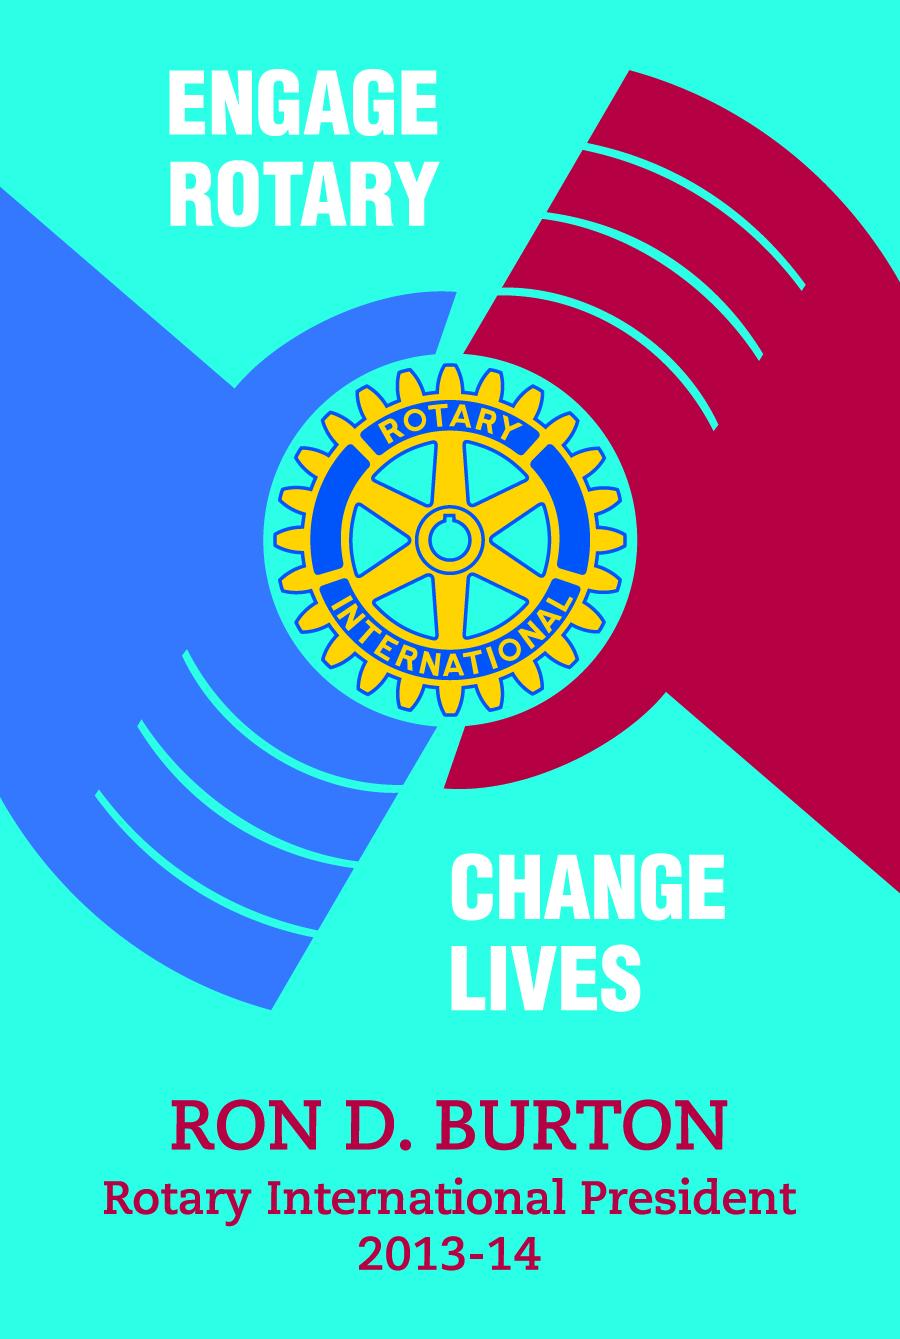 rotary international theme engage rotary change lives 2013 14